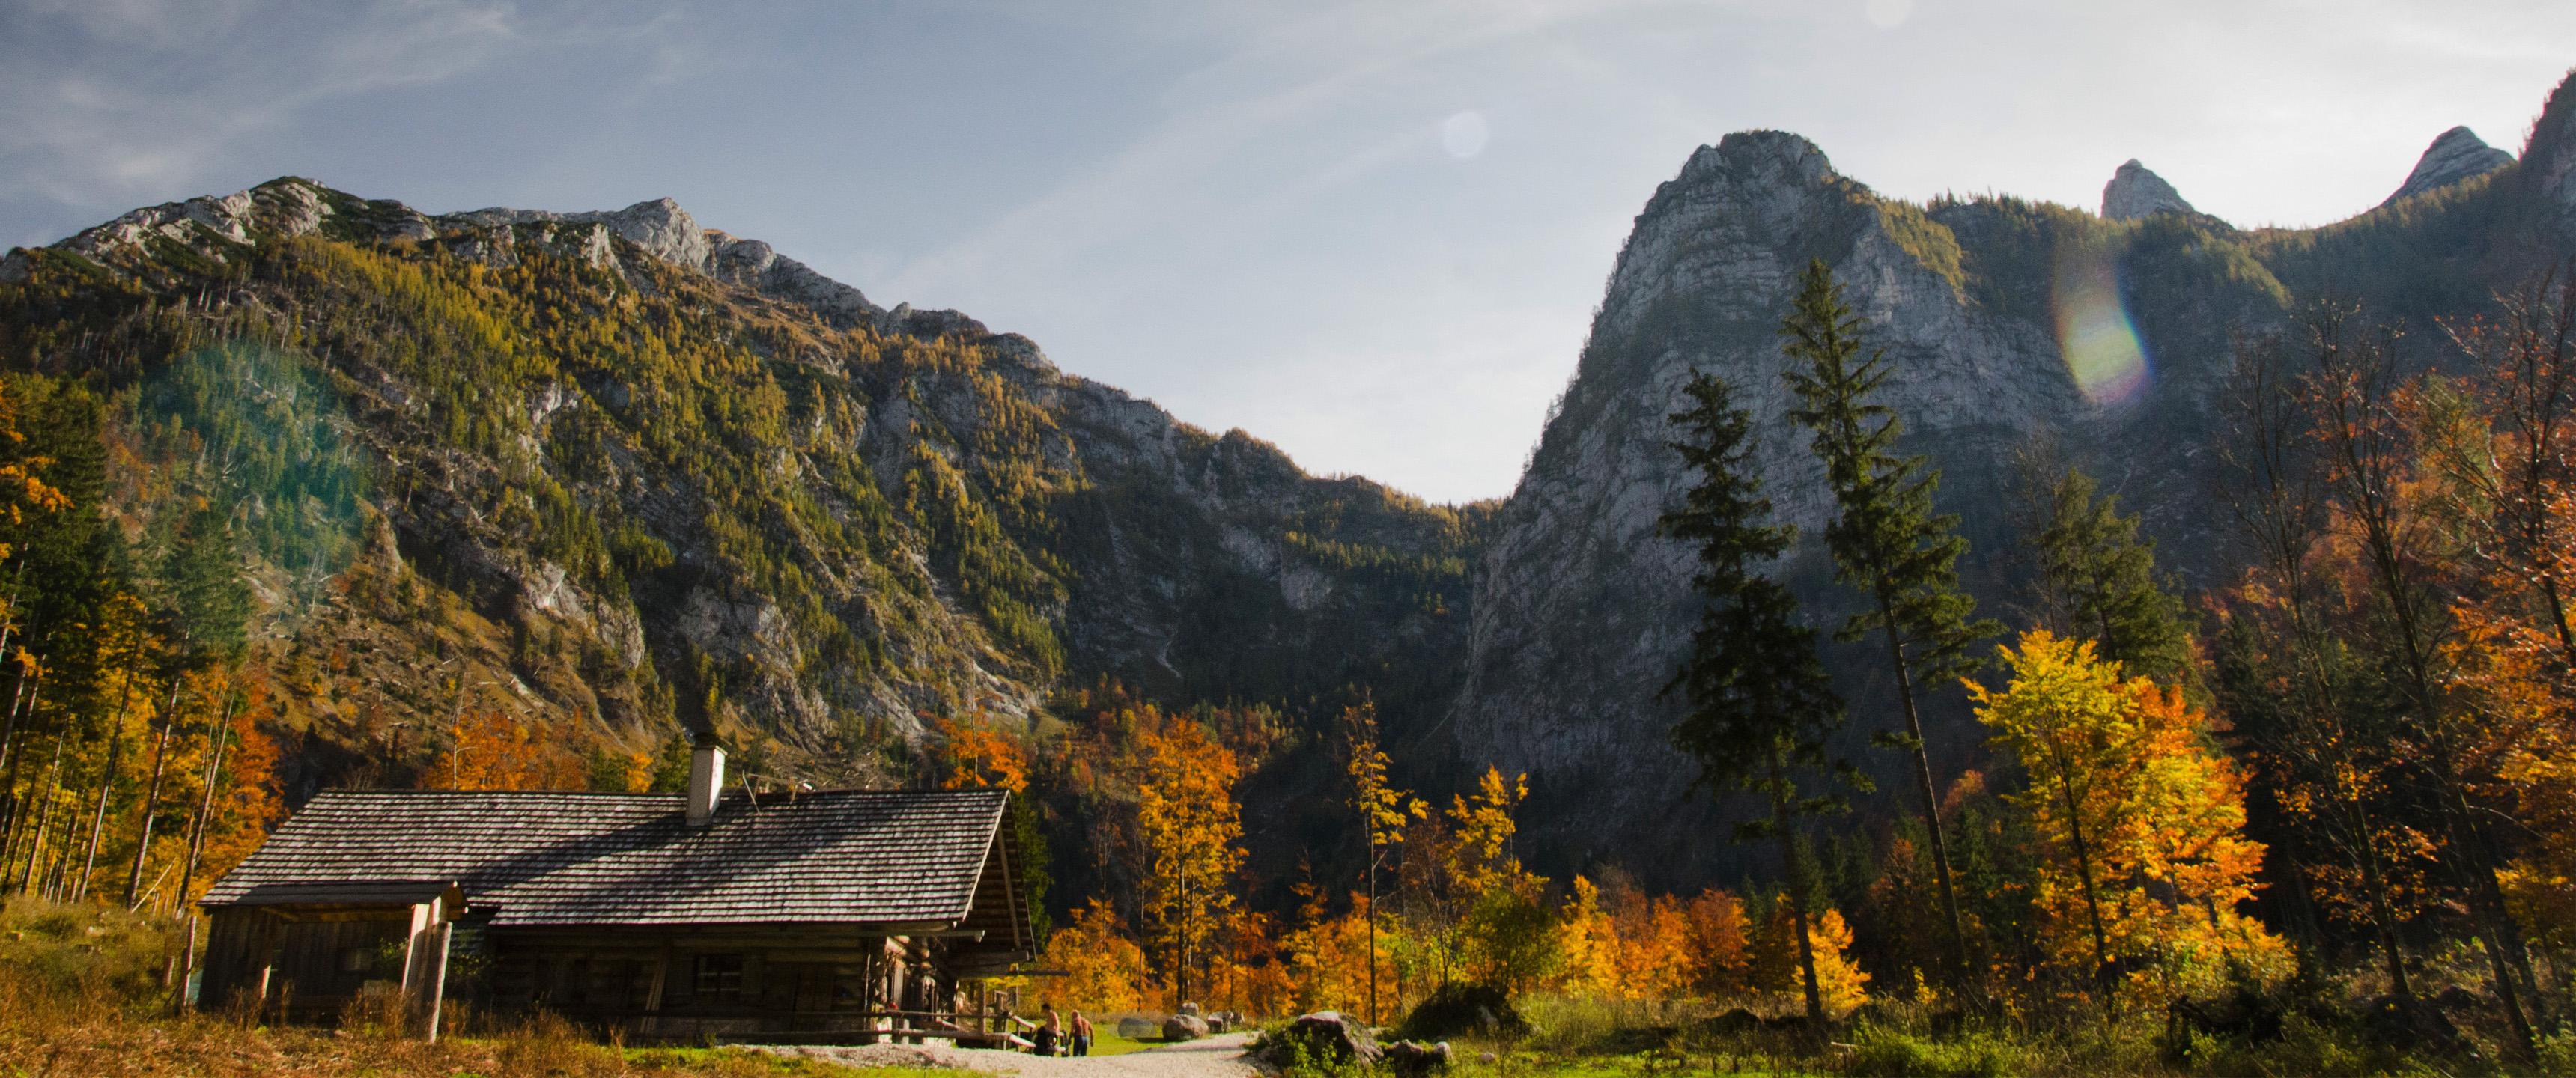 21 landscape wallpapers - photo #41